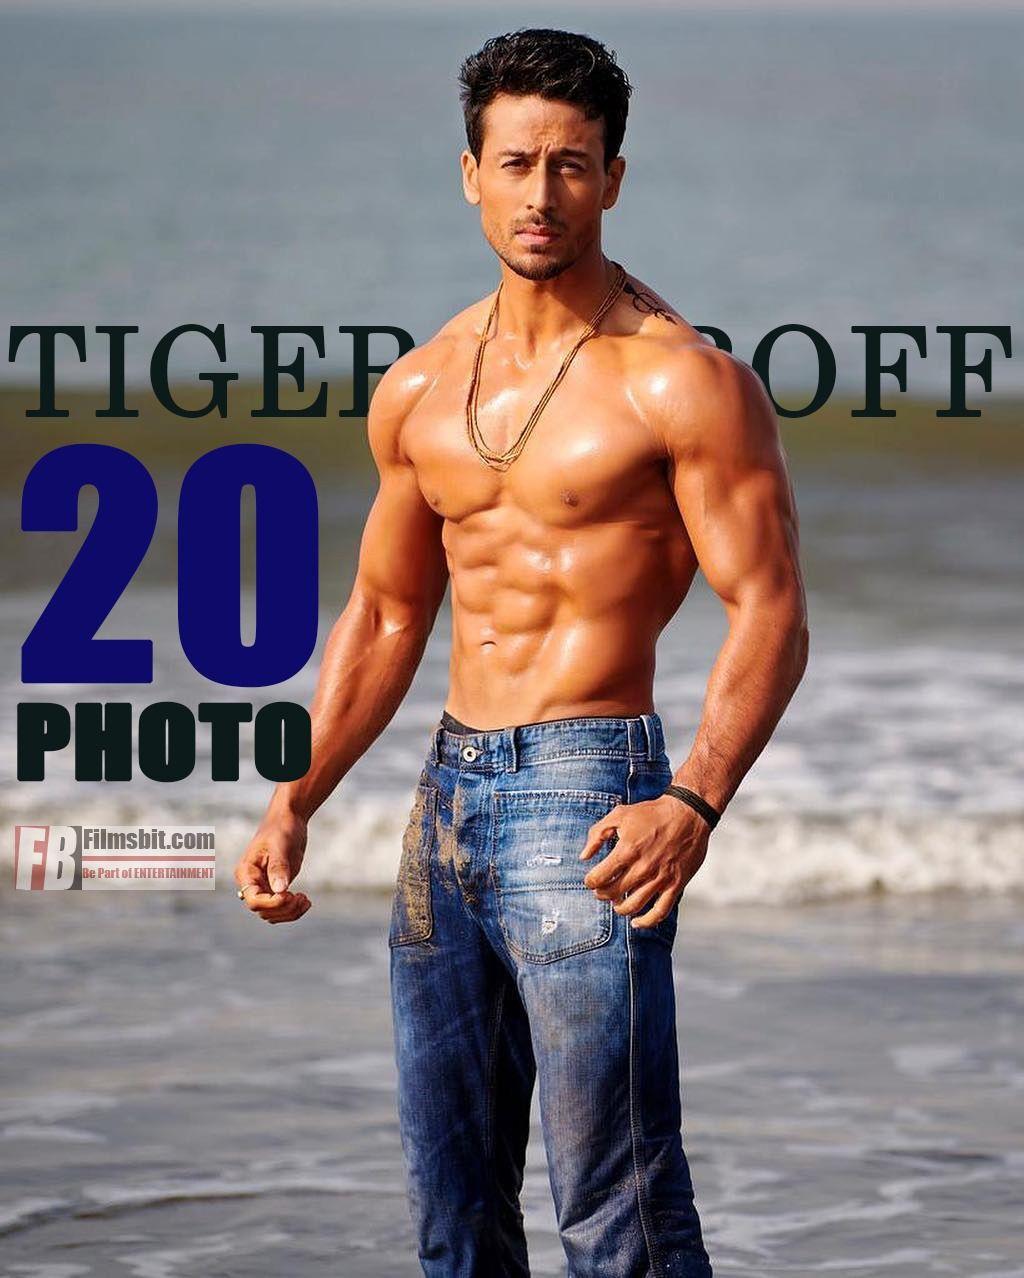 Tattoo Of Tiger Shroff Hand In 2020 Tiger Shroff Body Tiger Shroff Workout Routine